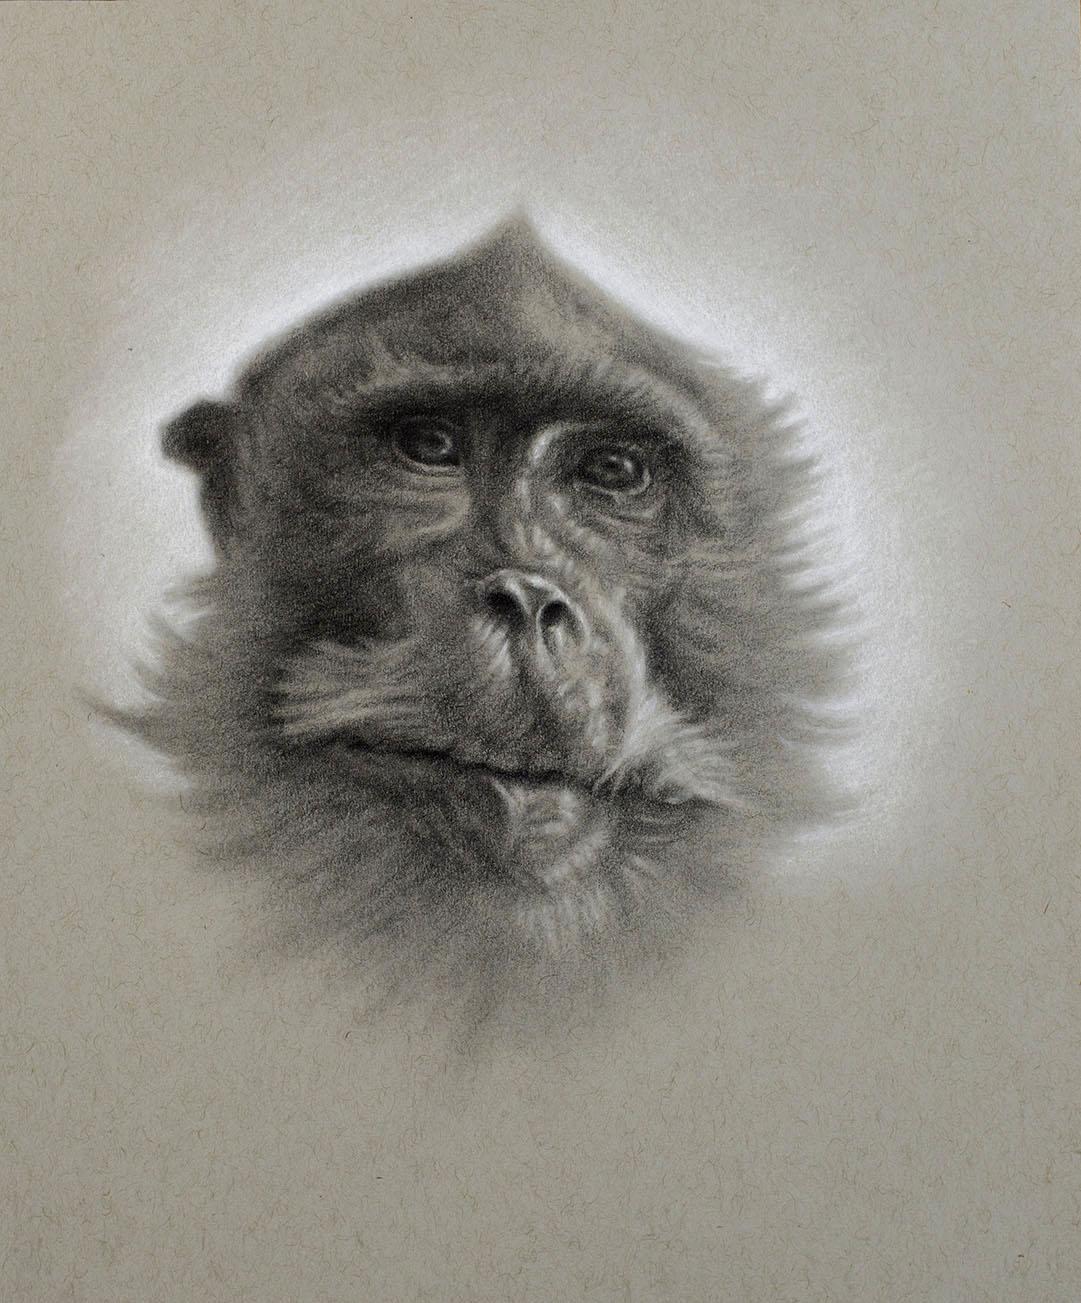 -Macaque drawing 1.jpg